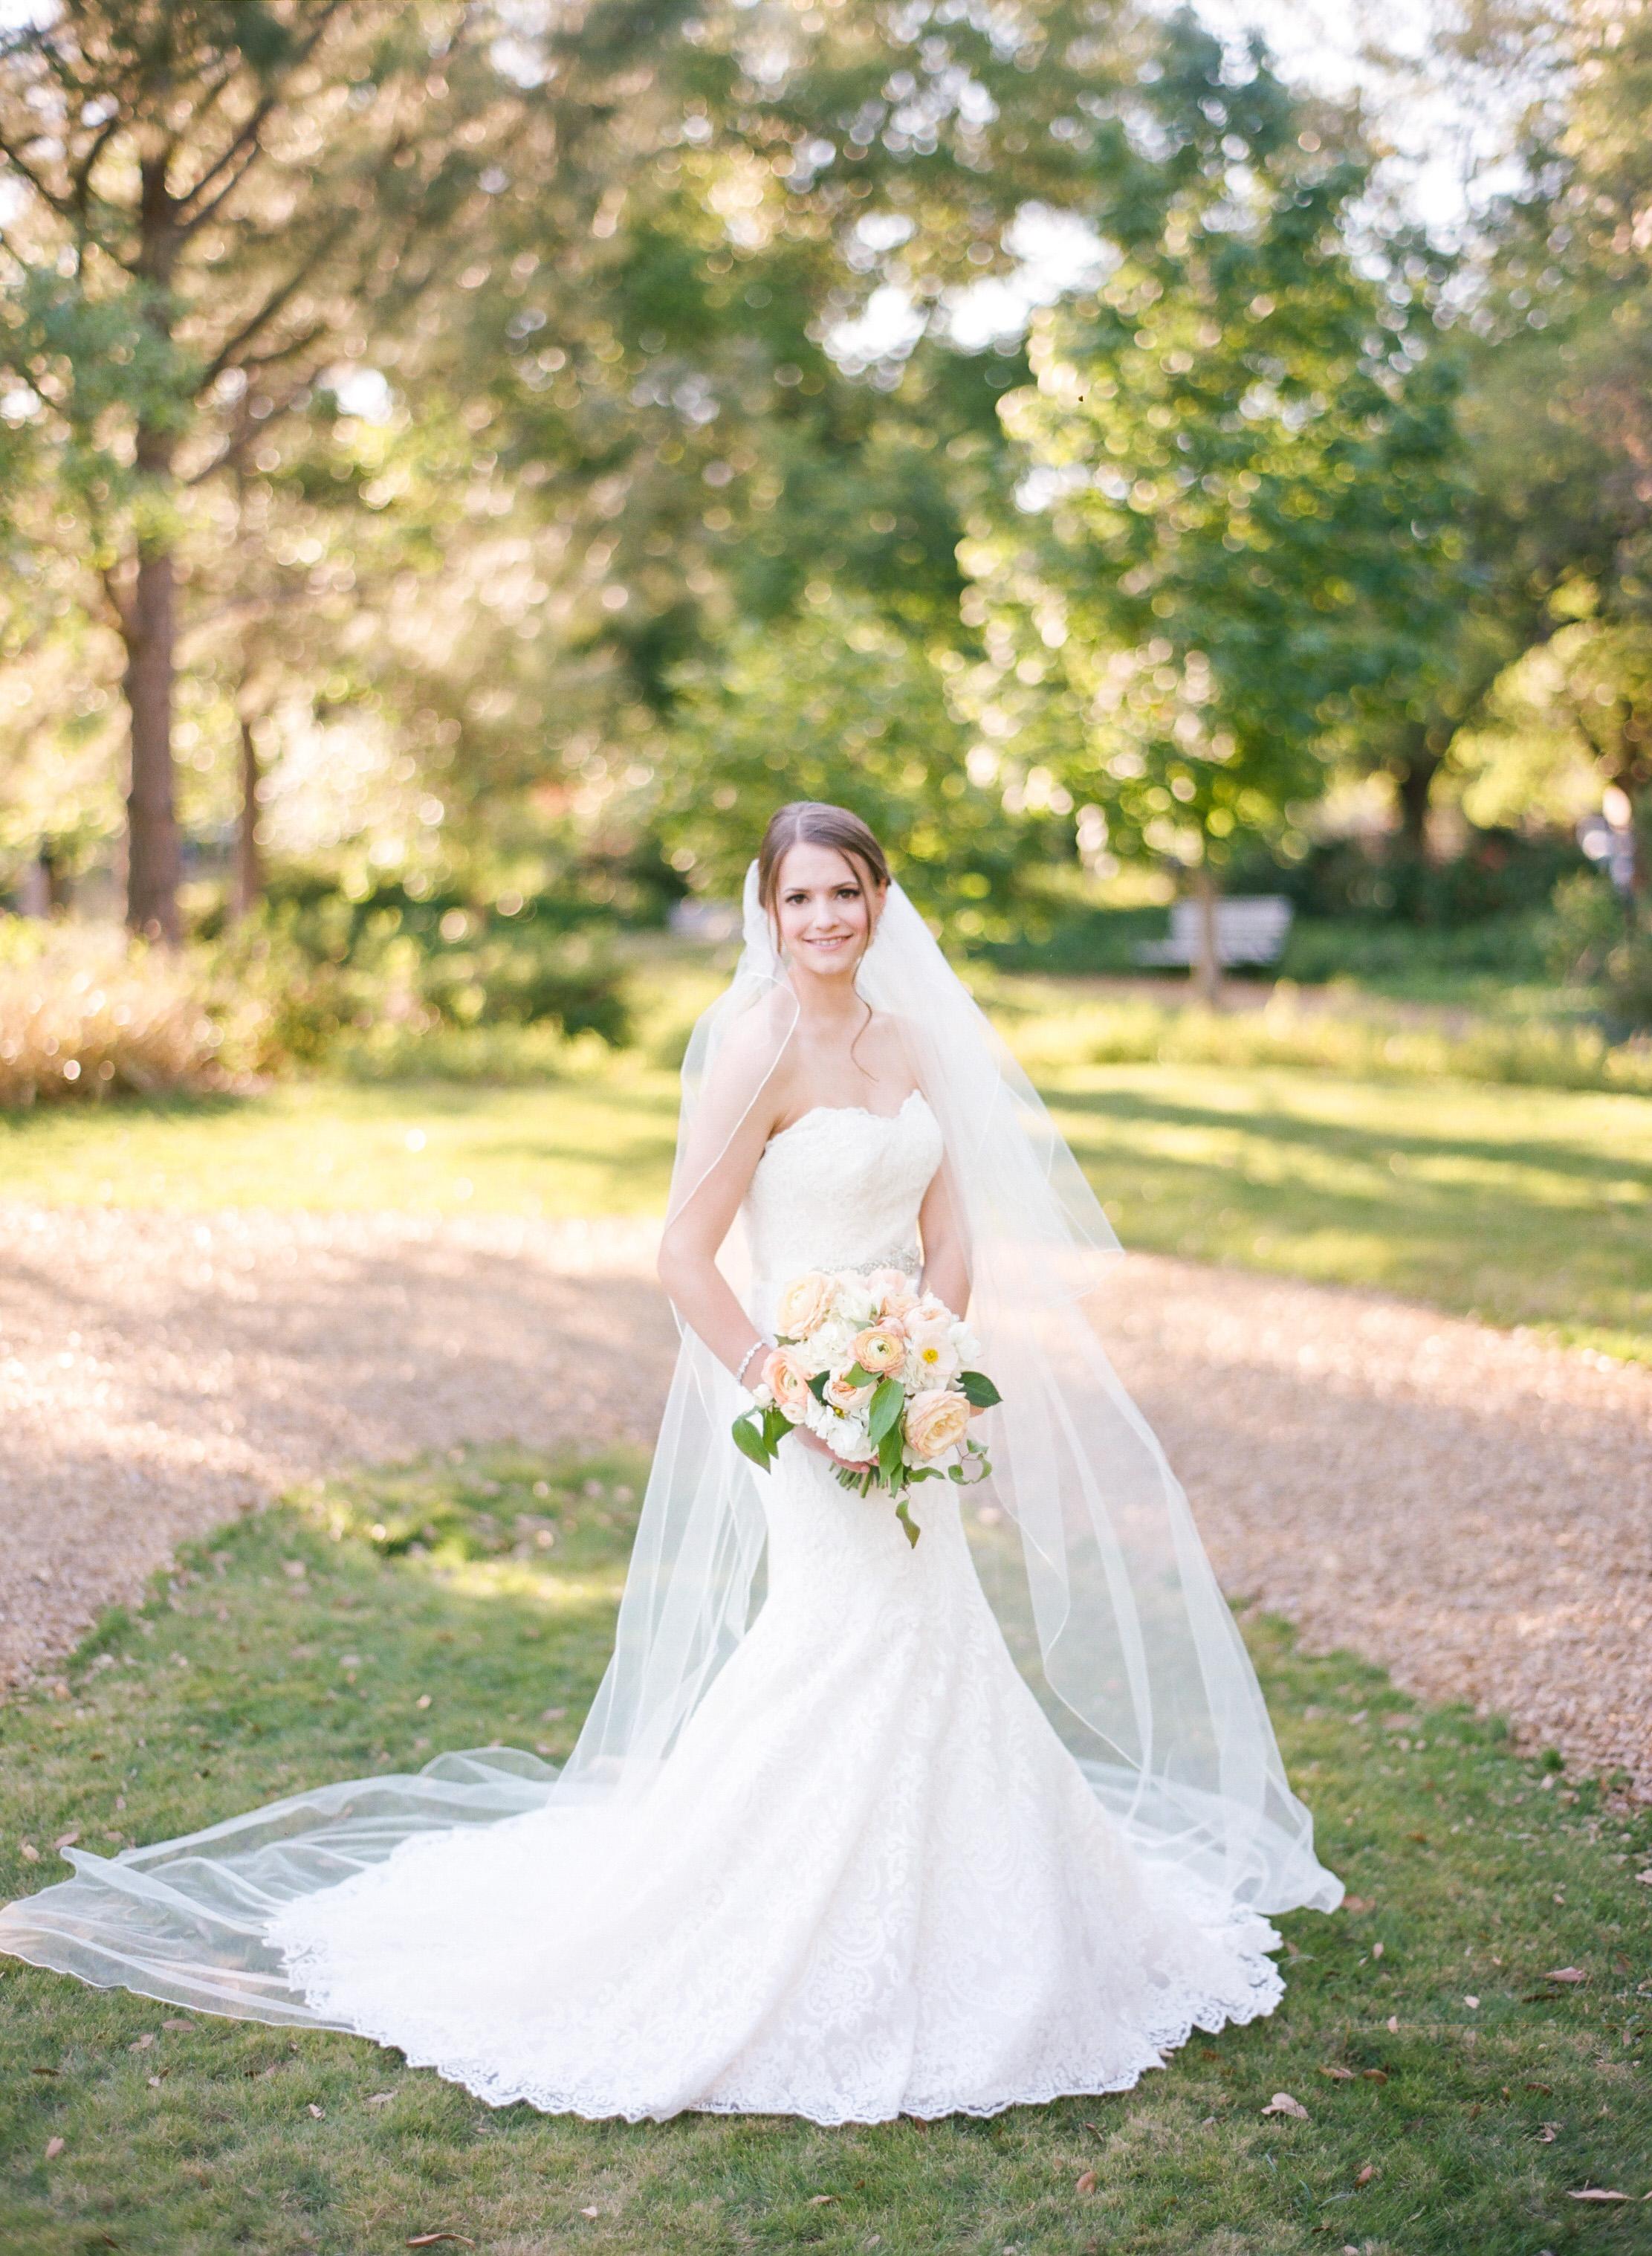 Houston-Wedding-Photographer-Film-Fine-Art-Bridals-Dana Fernandez-Photography-3.jpg